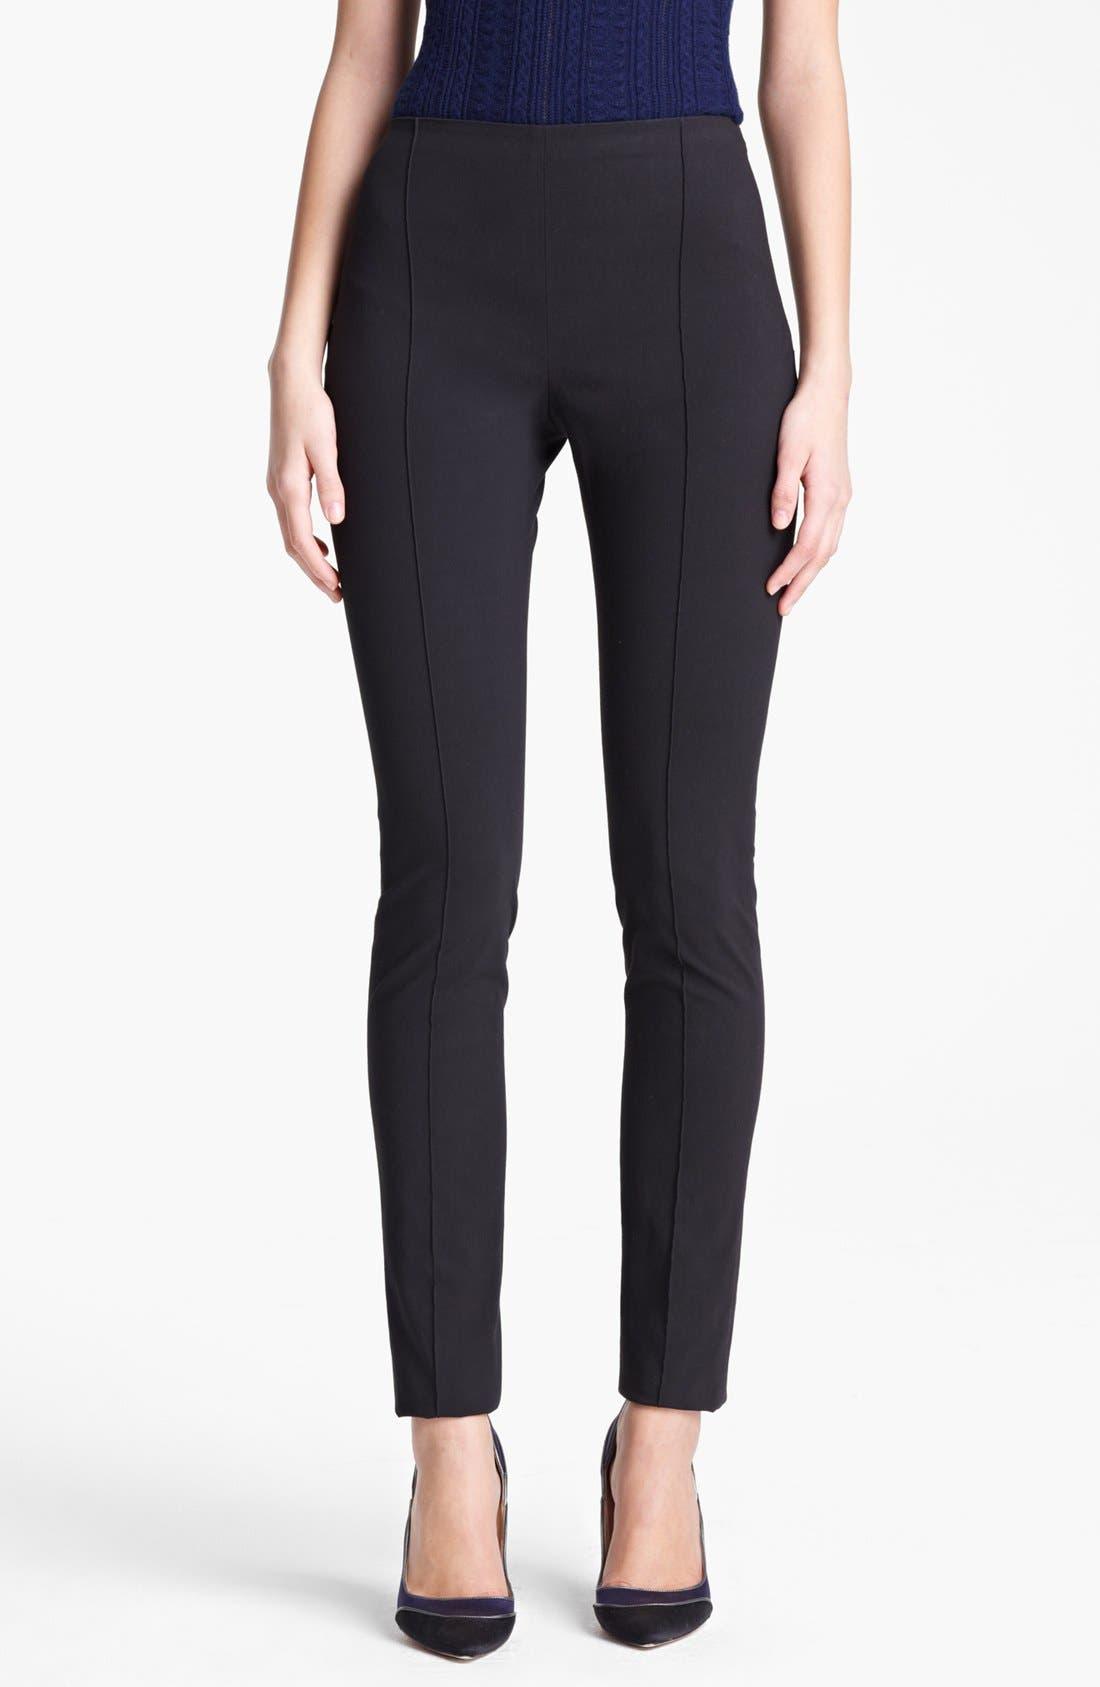 Alternate Image 1 Selected - Oscar de la Renta High Waist Slim Pants